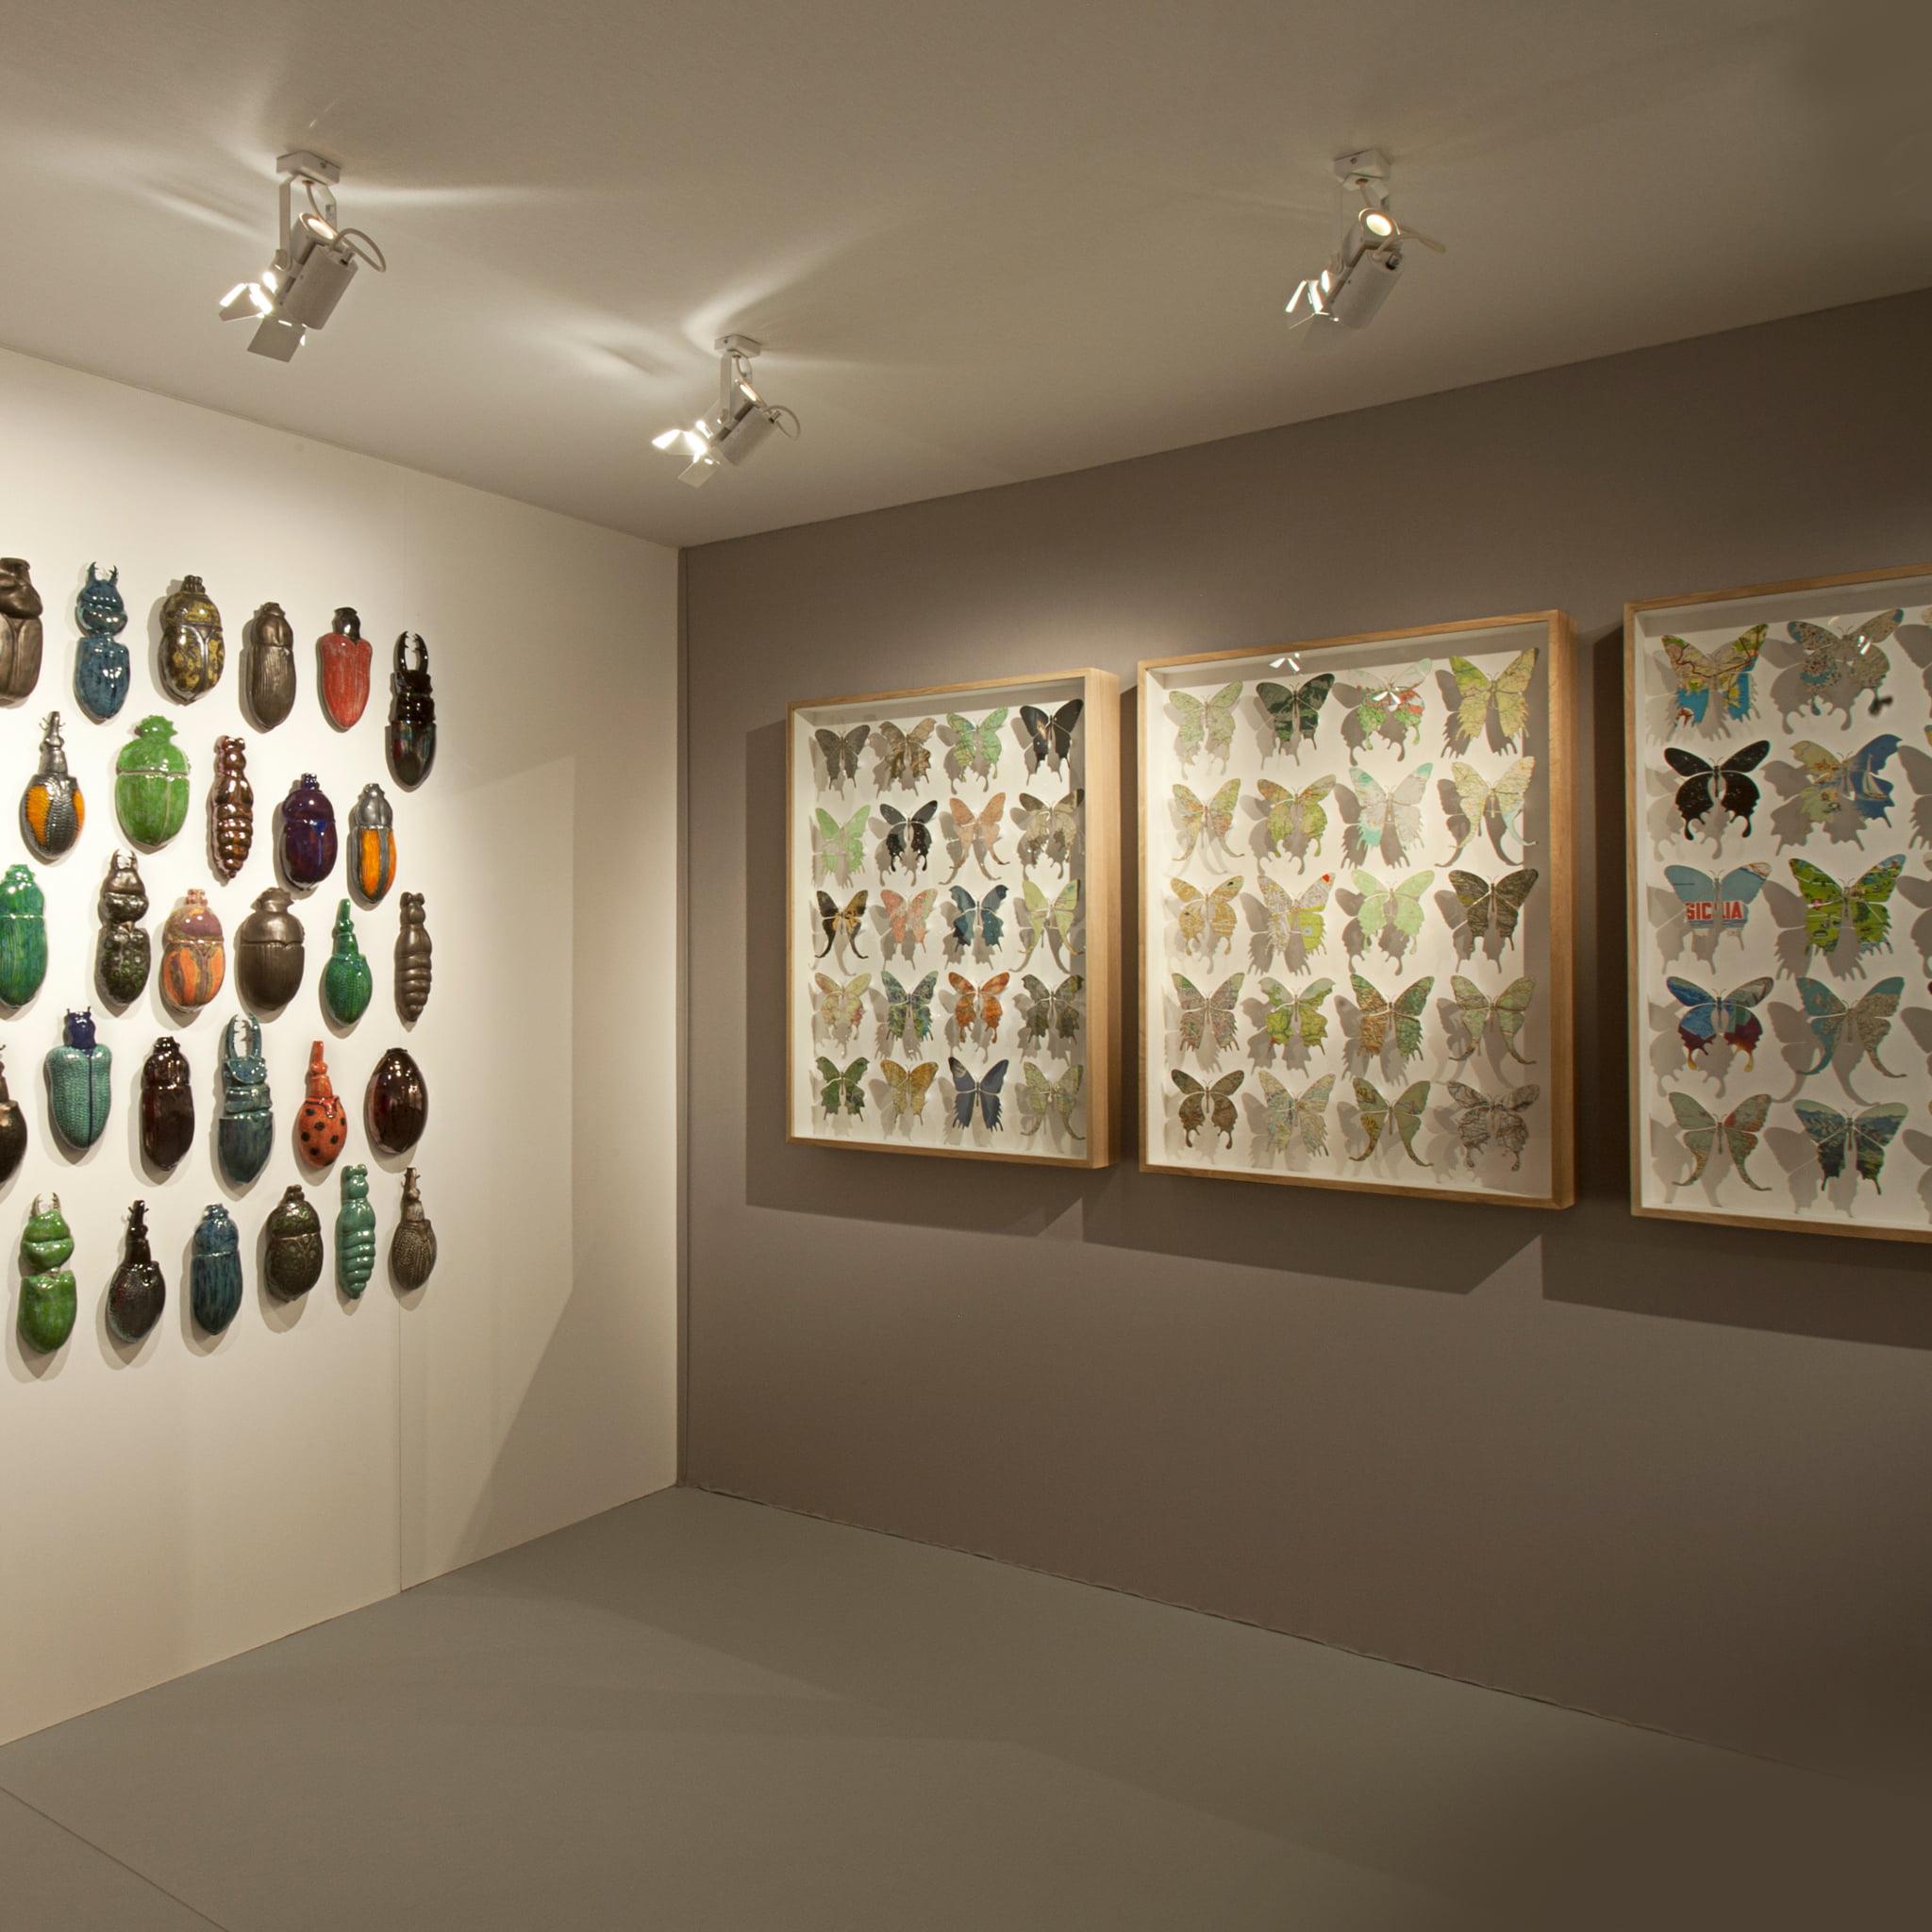 Maison-et-Objet-2011-Paris-imagesurgery-butterfly-art-2